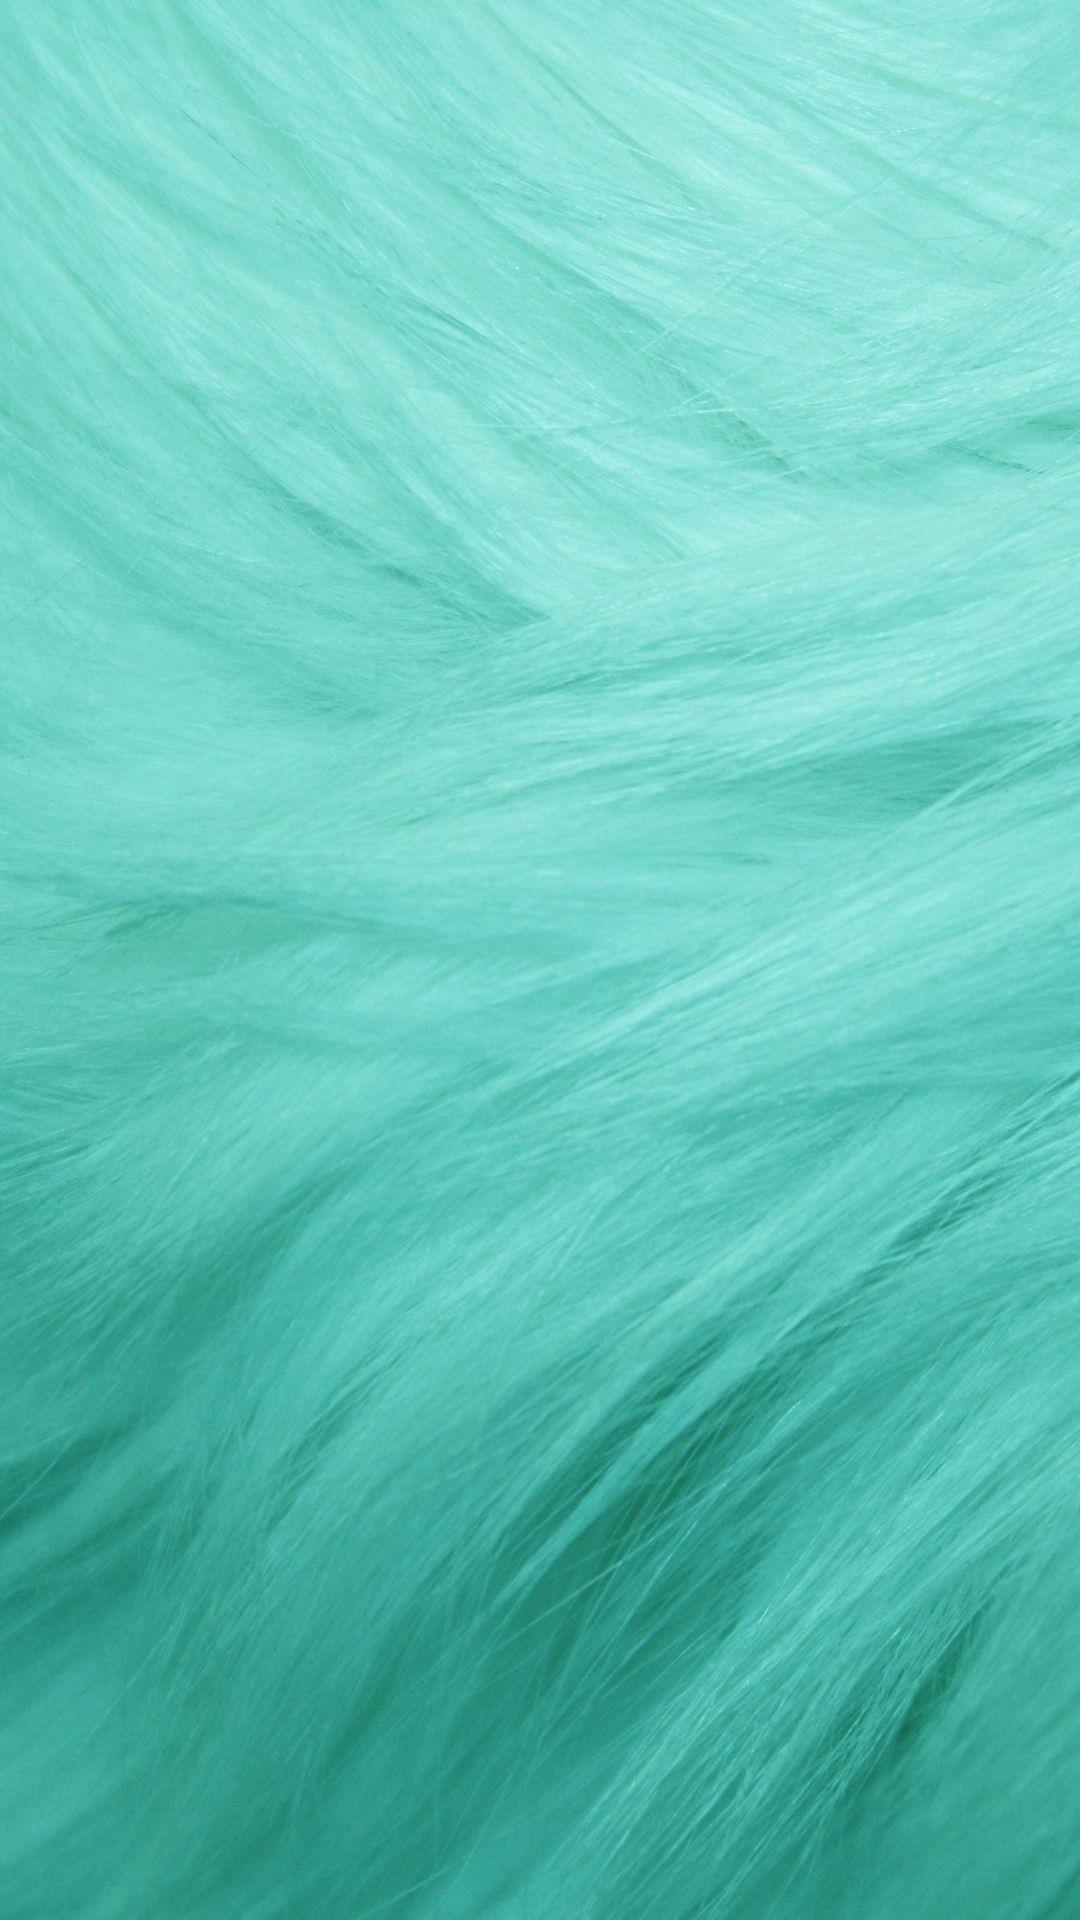 Mint Green Wallpaper Hd Images Widescreen Page Of Desktop Mint Green Iphone 11 1080x1920 Wallpaper Teahub Io